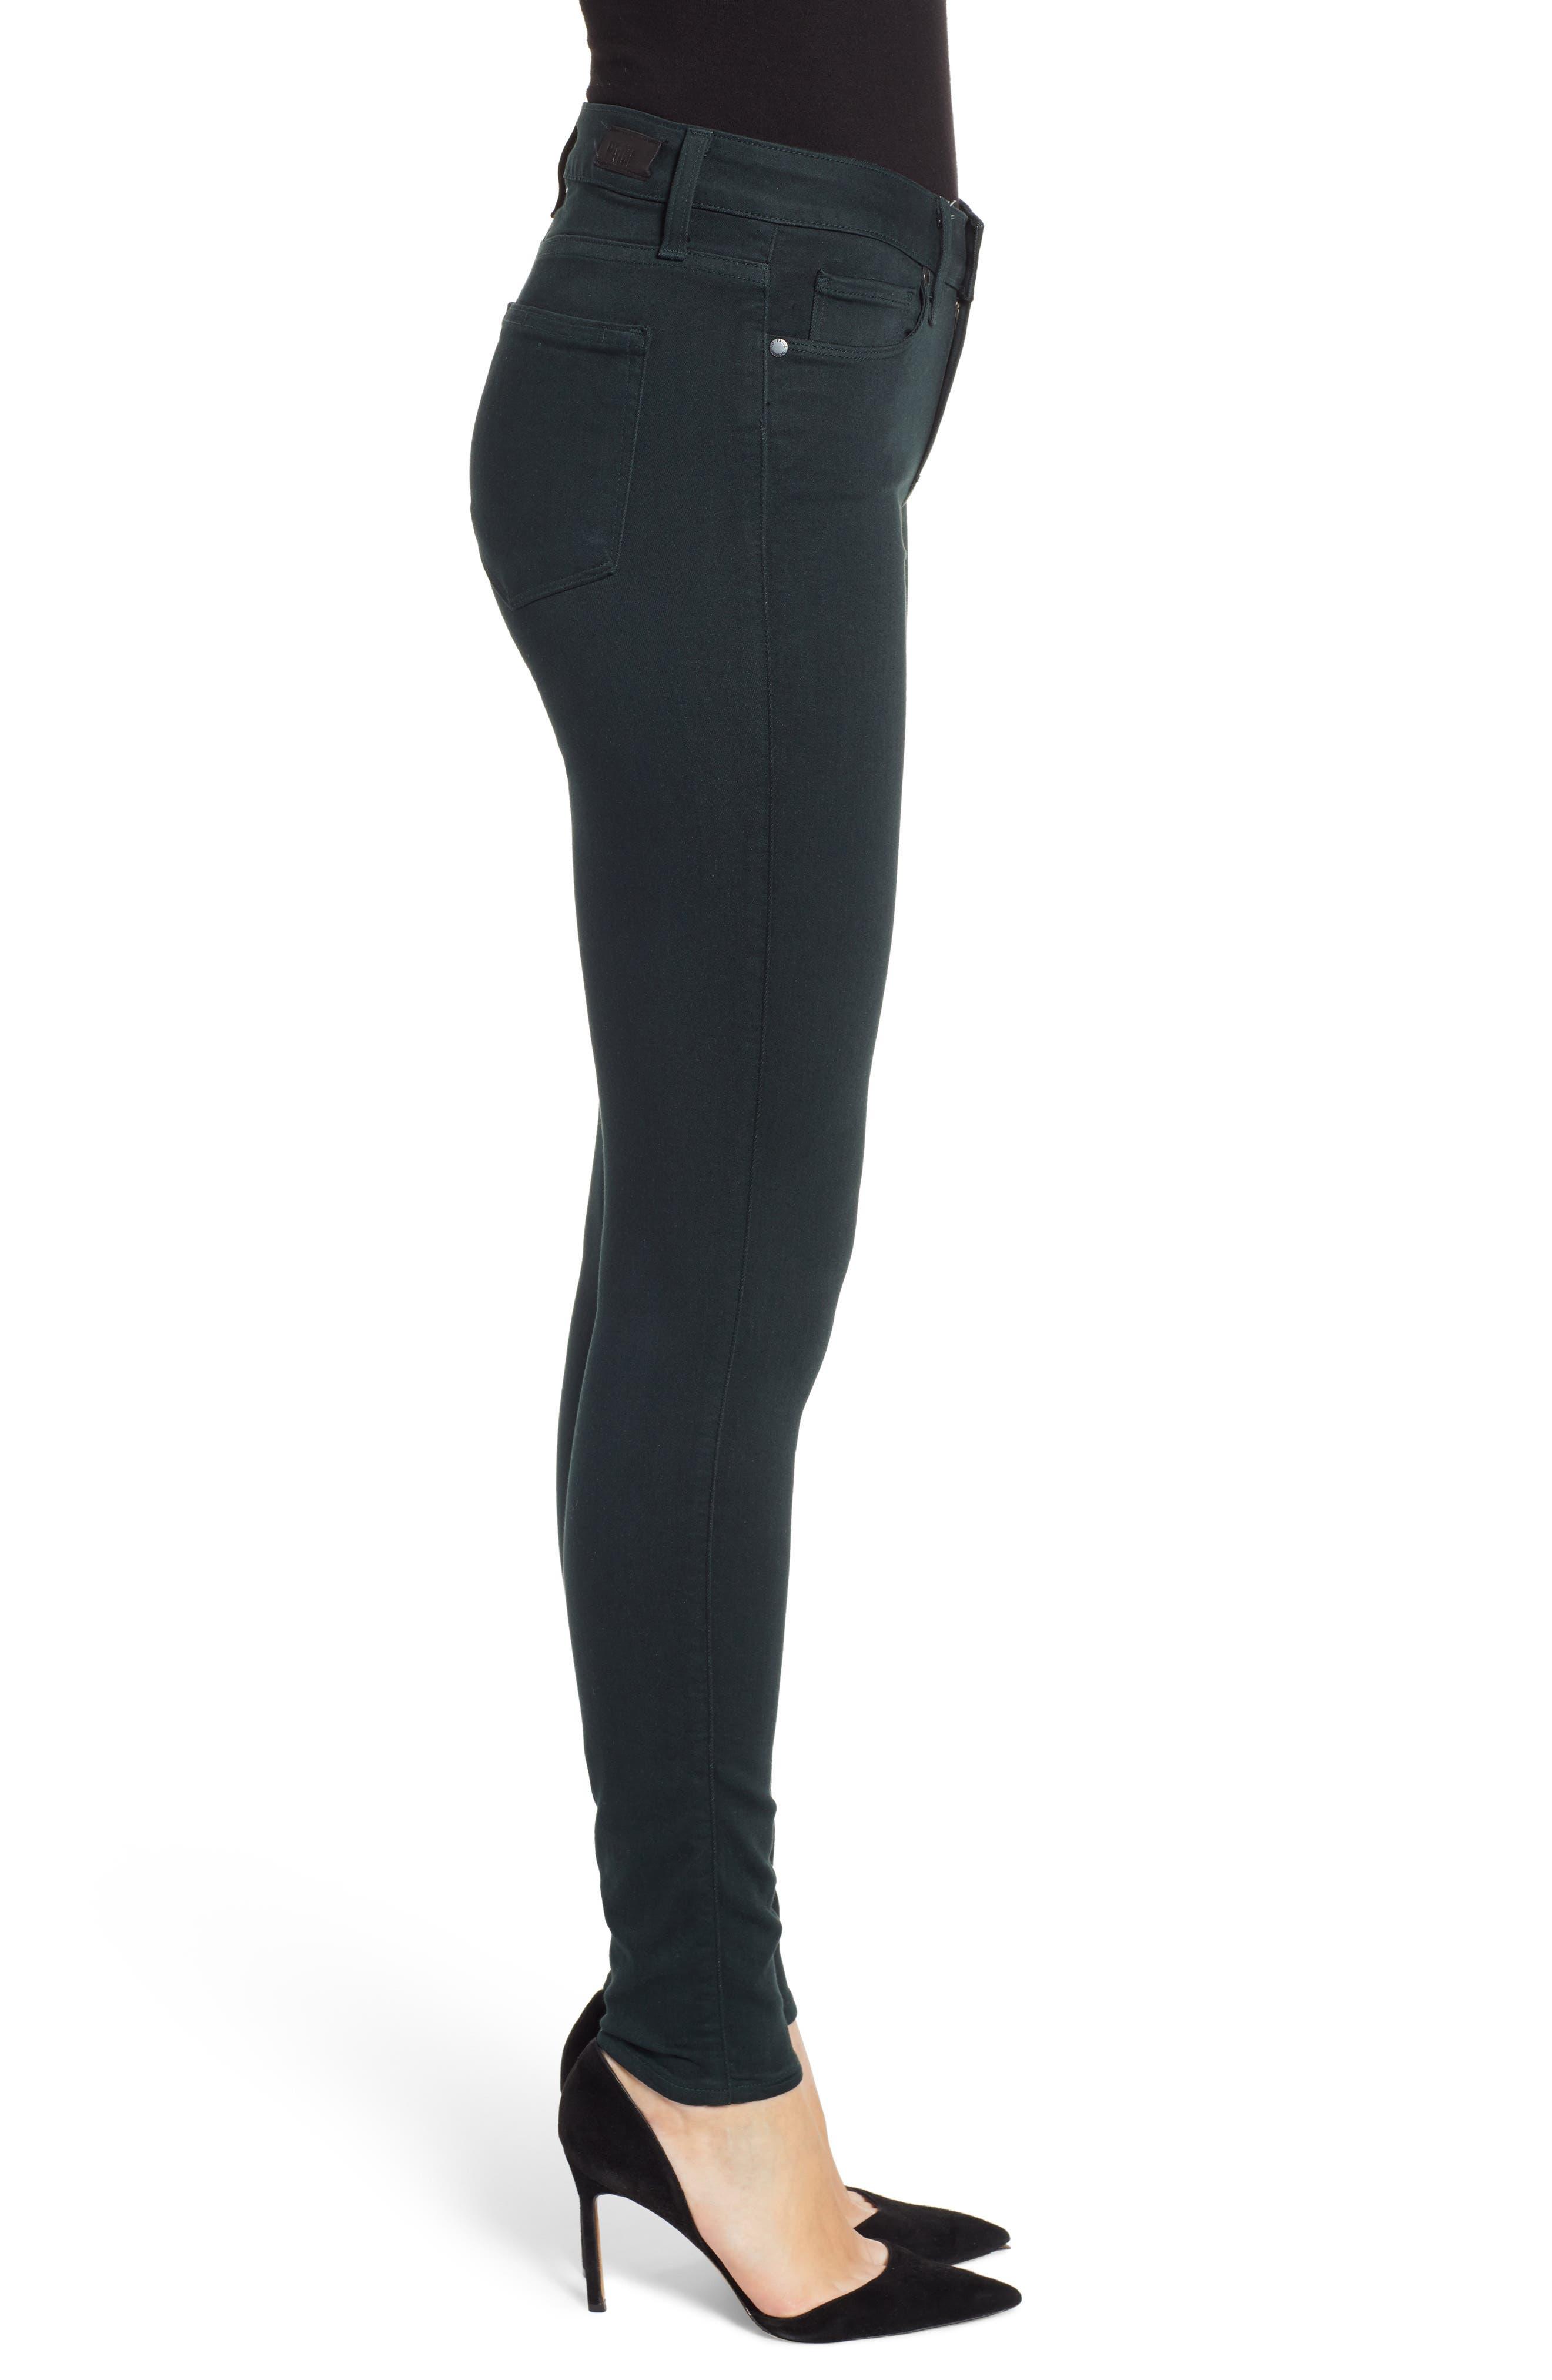 Transcend - Verdugo Ultra Skinny Jeans,                             Alternate thumbnail 3, color,                             MIDNIGHT GREEN